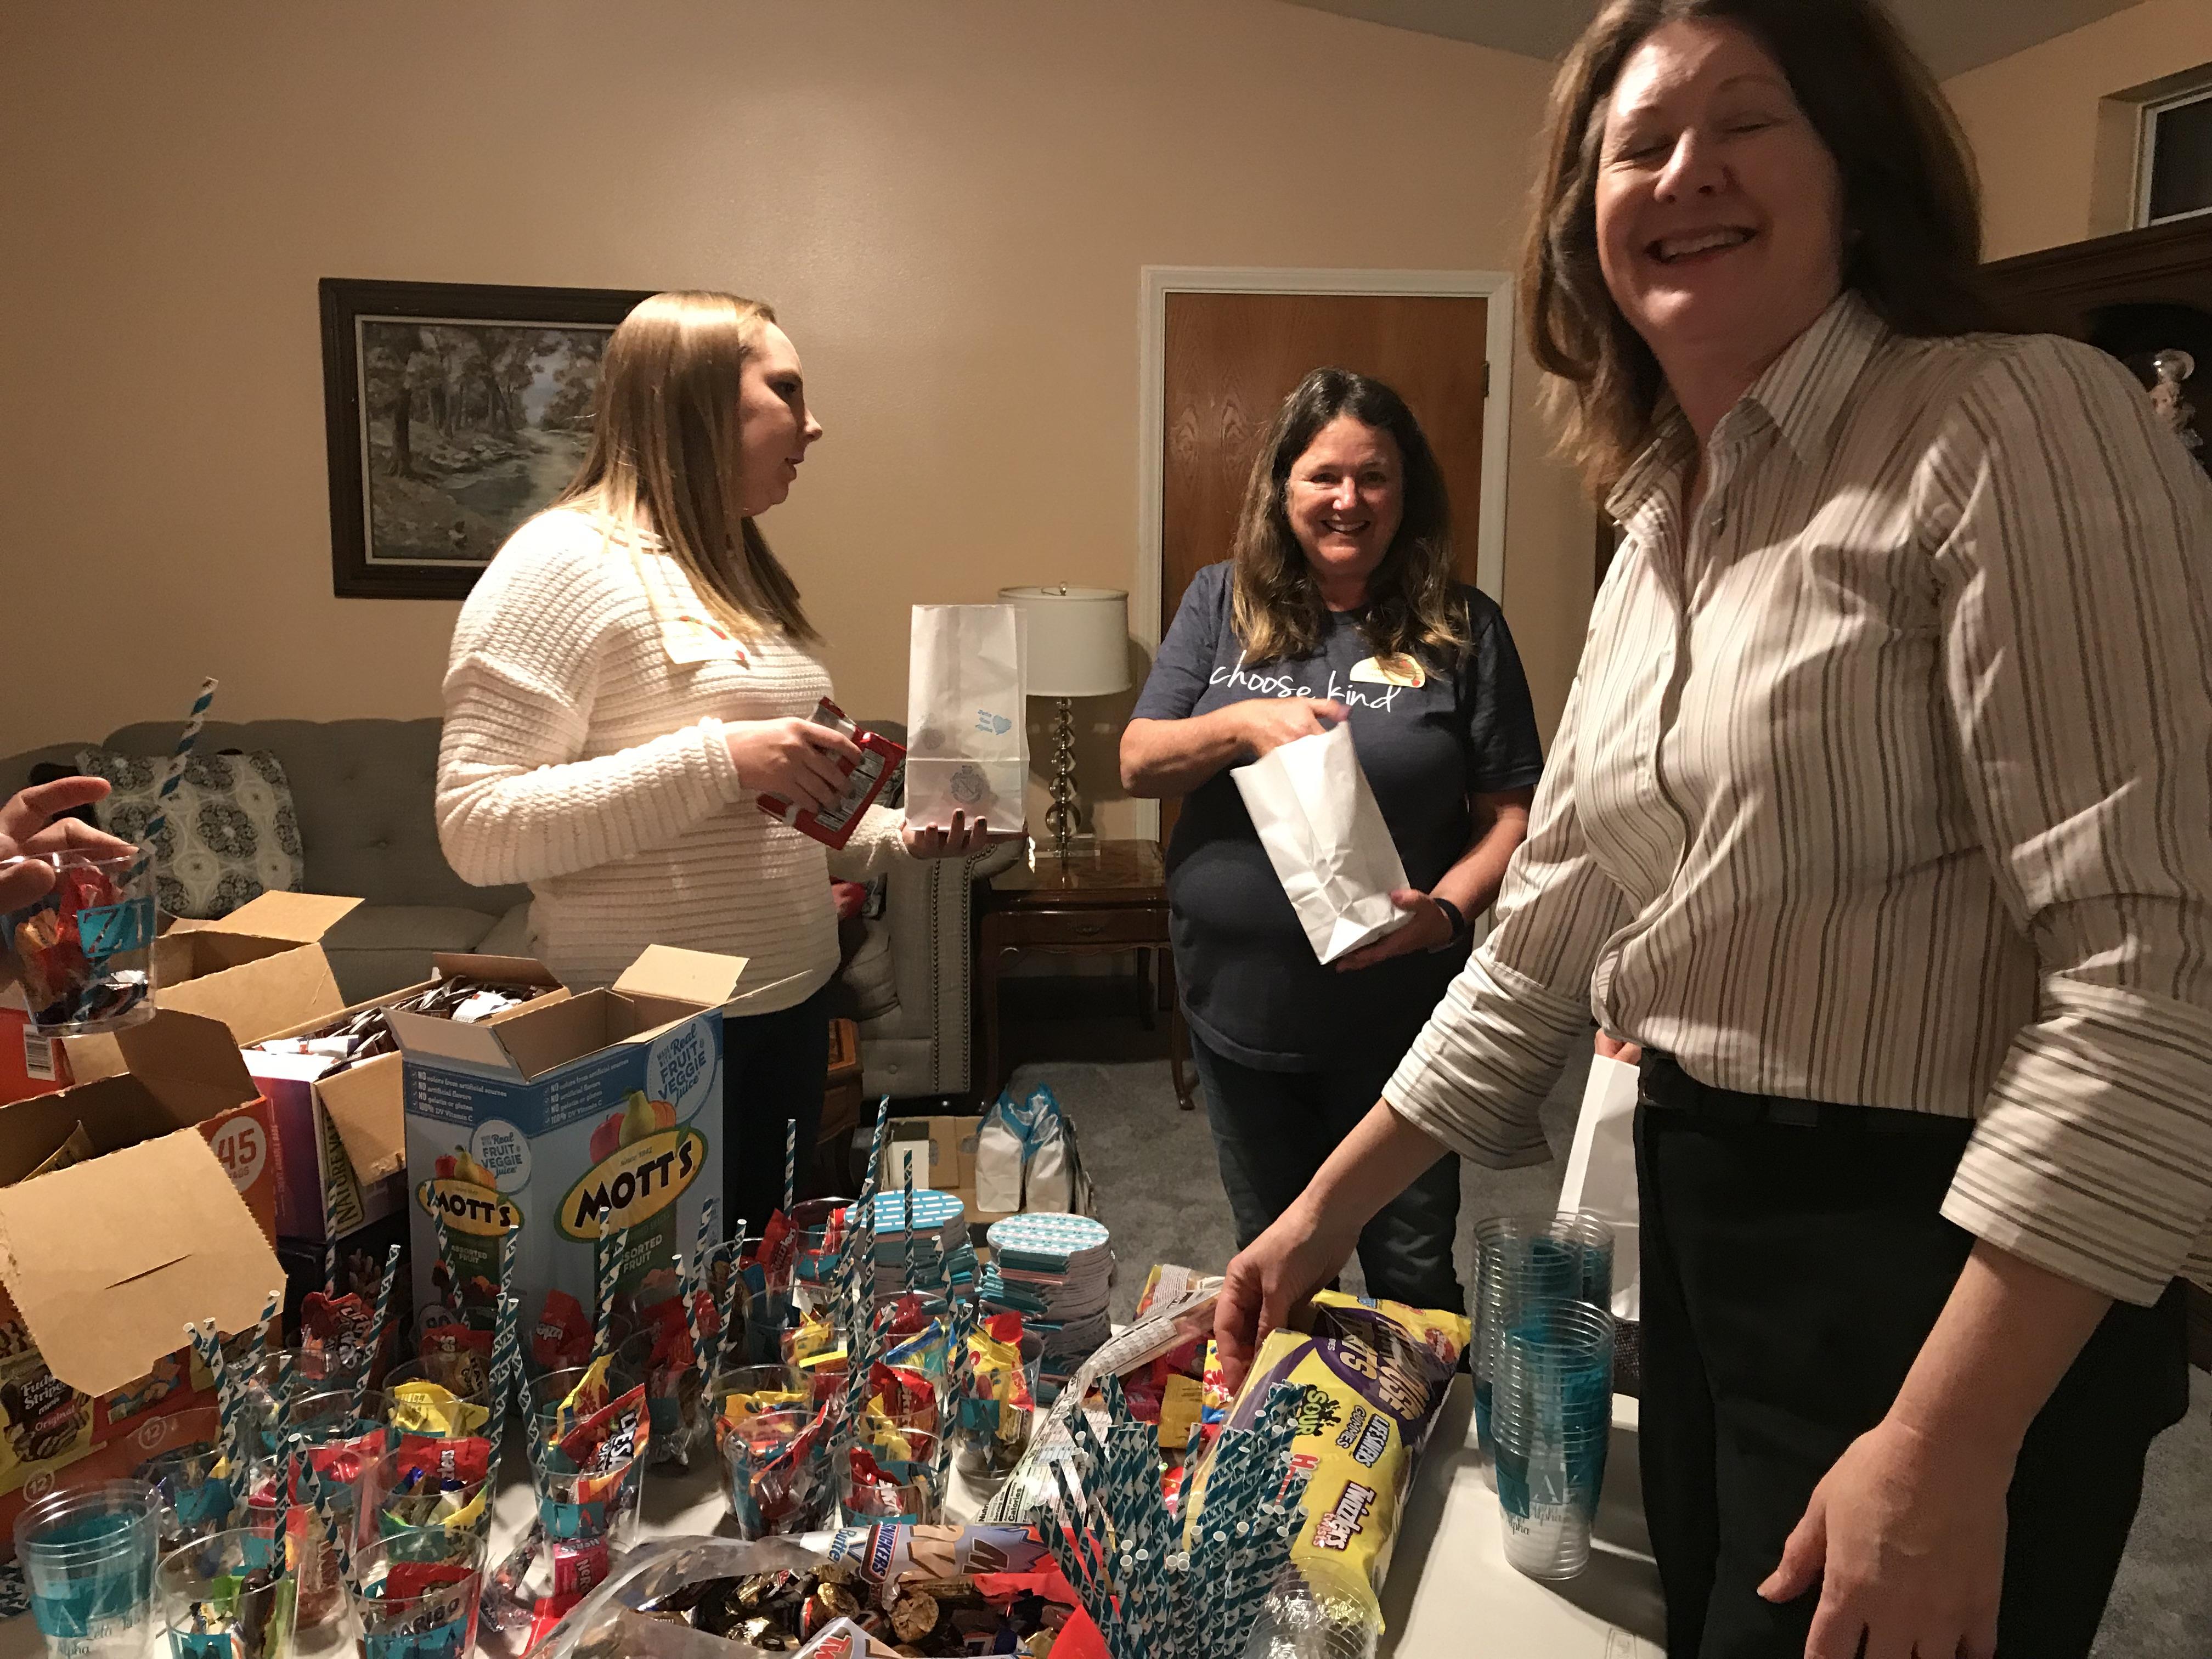 Taco Tuesday and Goodie Bags for Kappa Thetas (Feb 26, 2019)